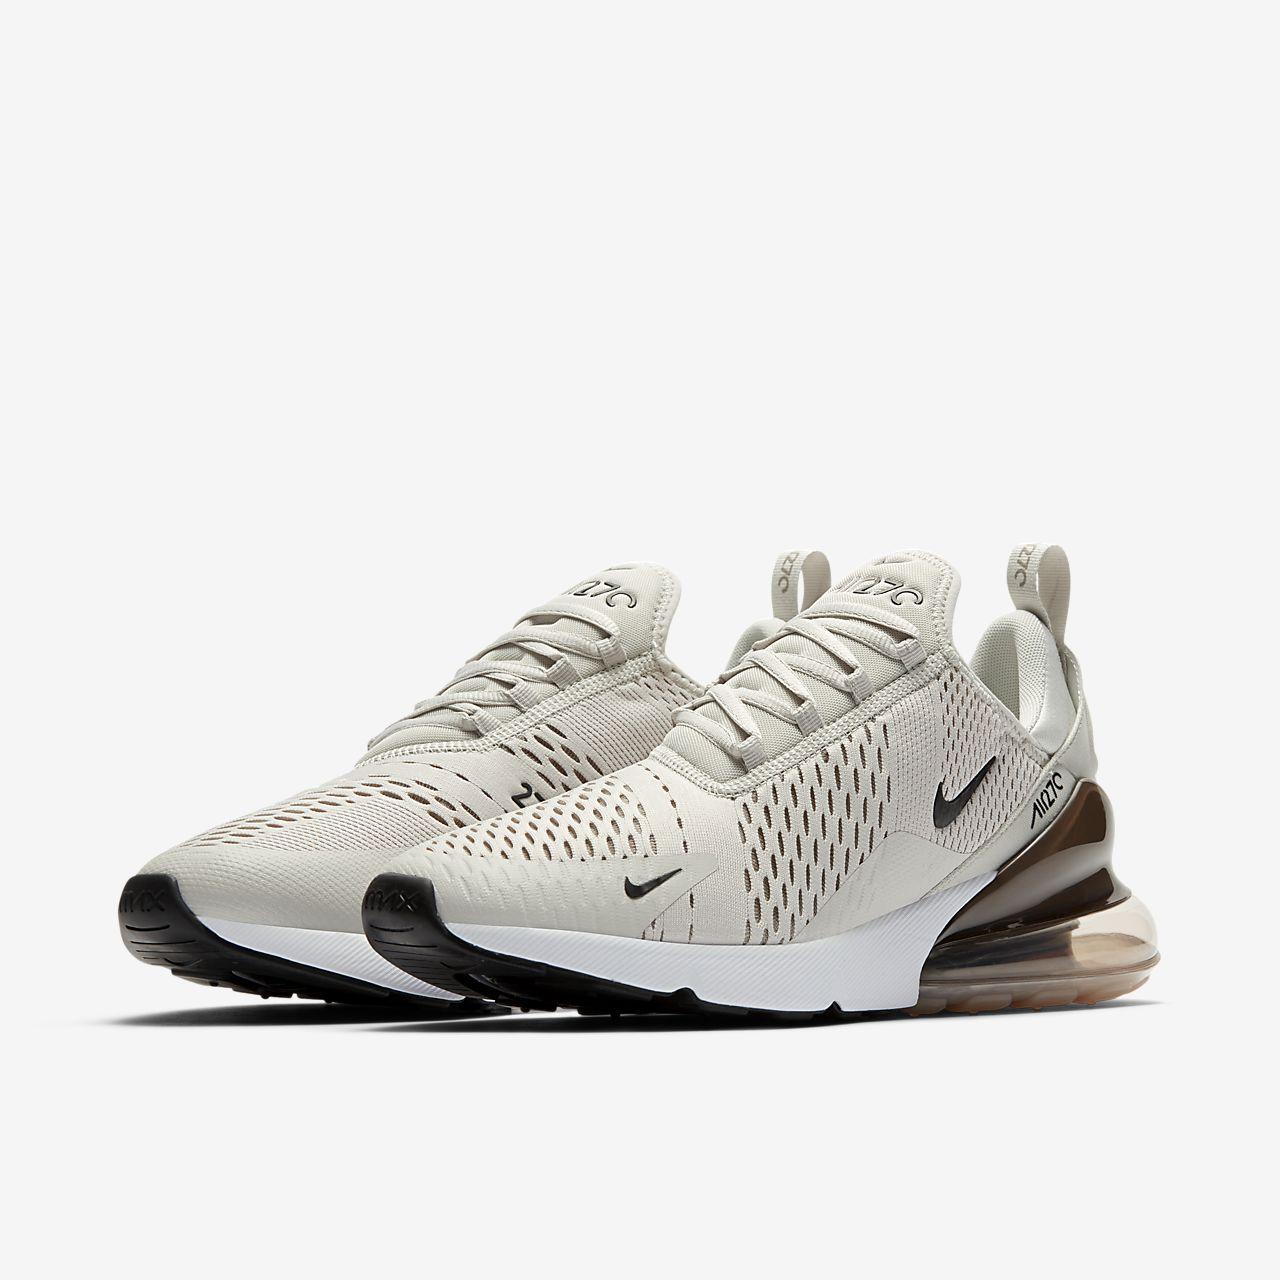 Chaussures Basses Wmns Air Max 1 Beige / Noir / Blanc Nike hgZYpO